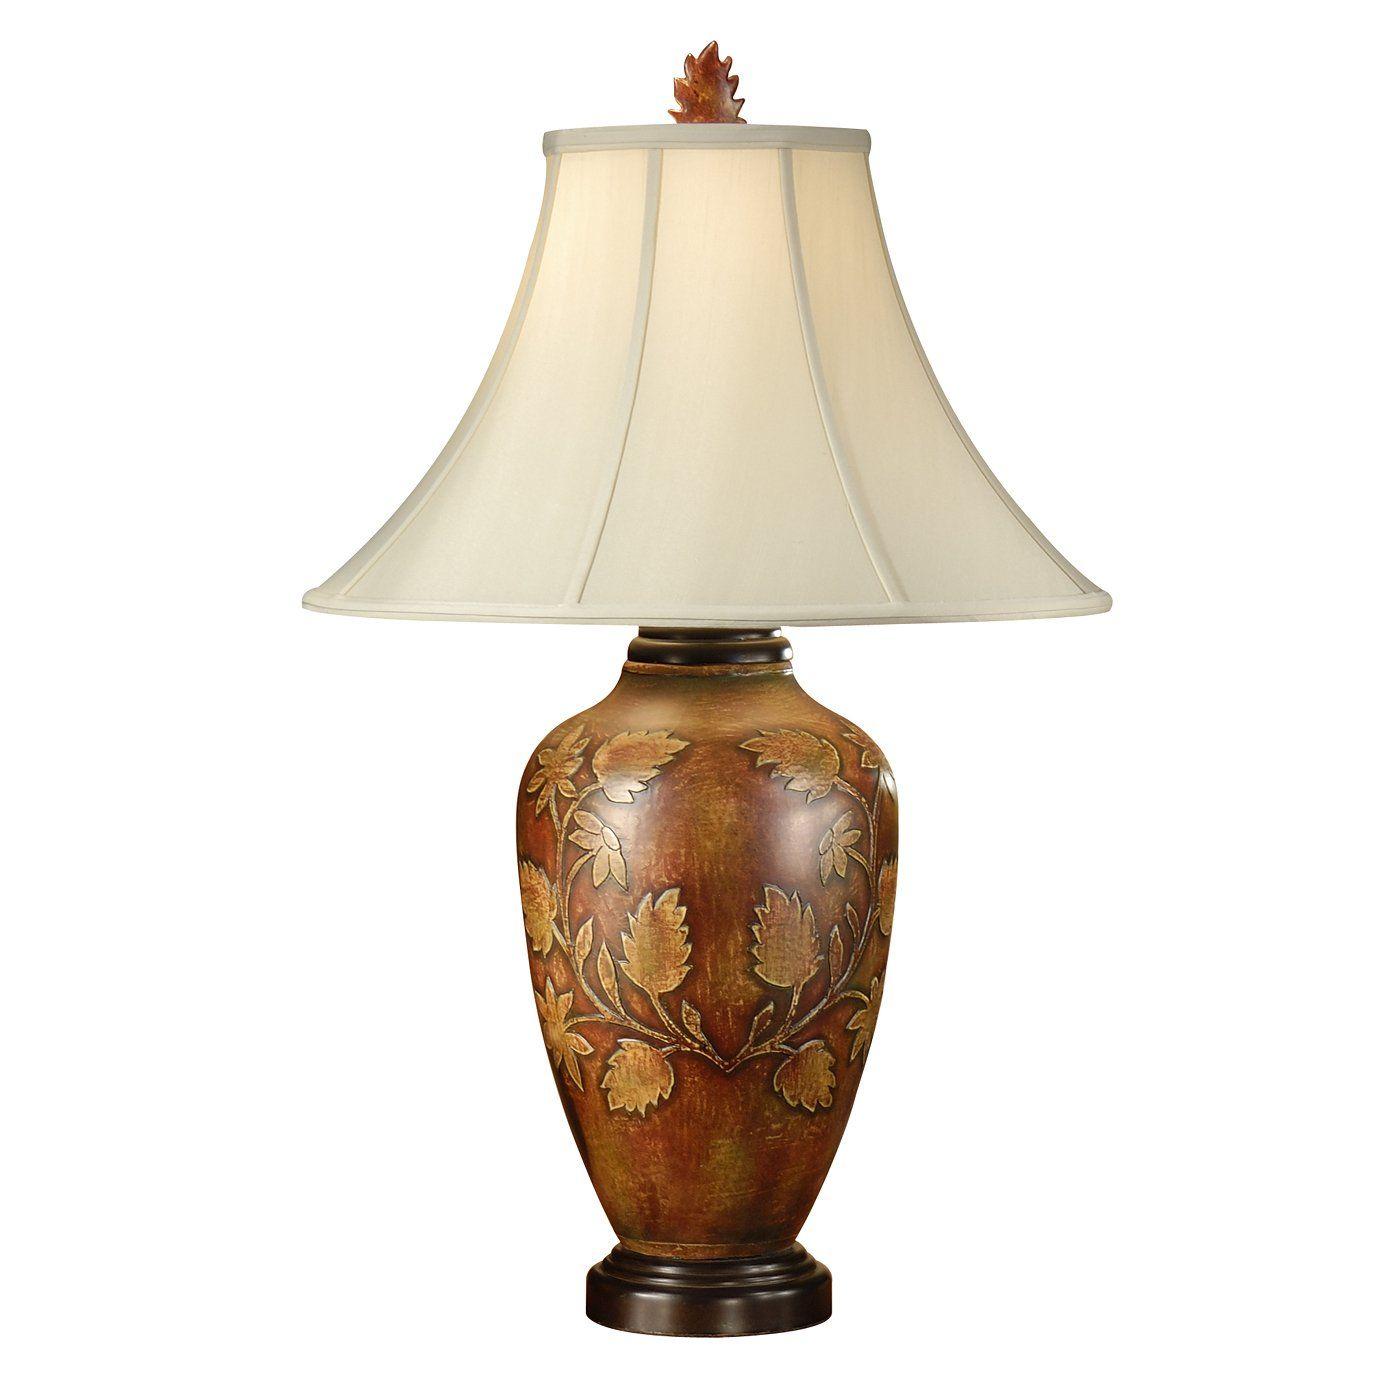 Wildwood 16077 Flandreau Table Lamp